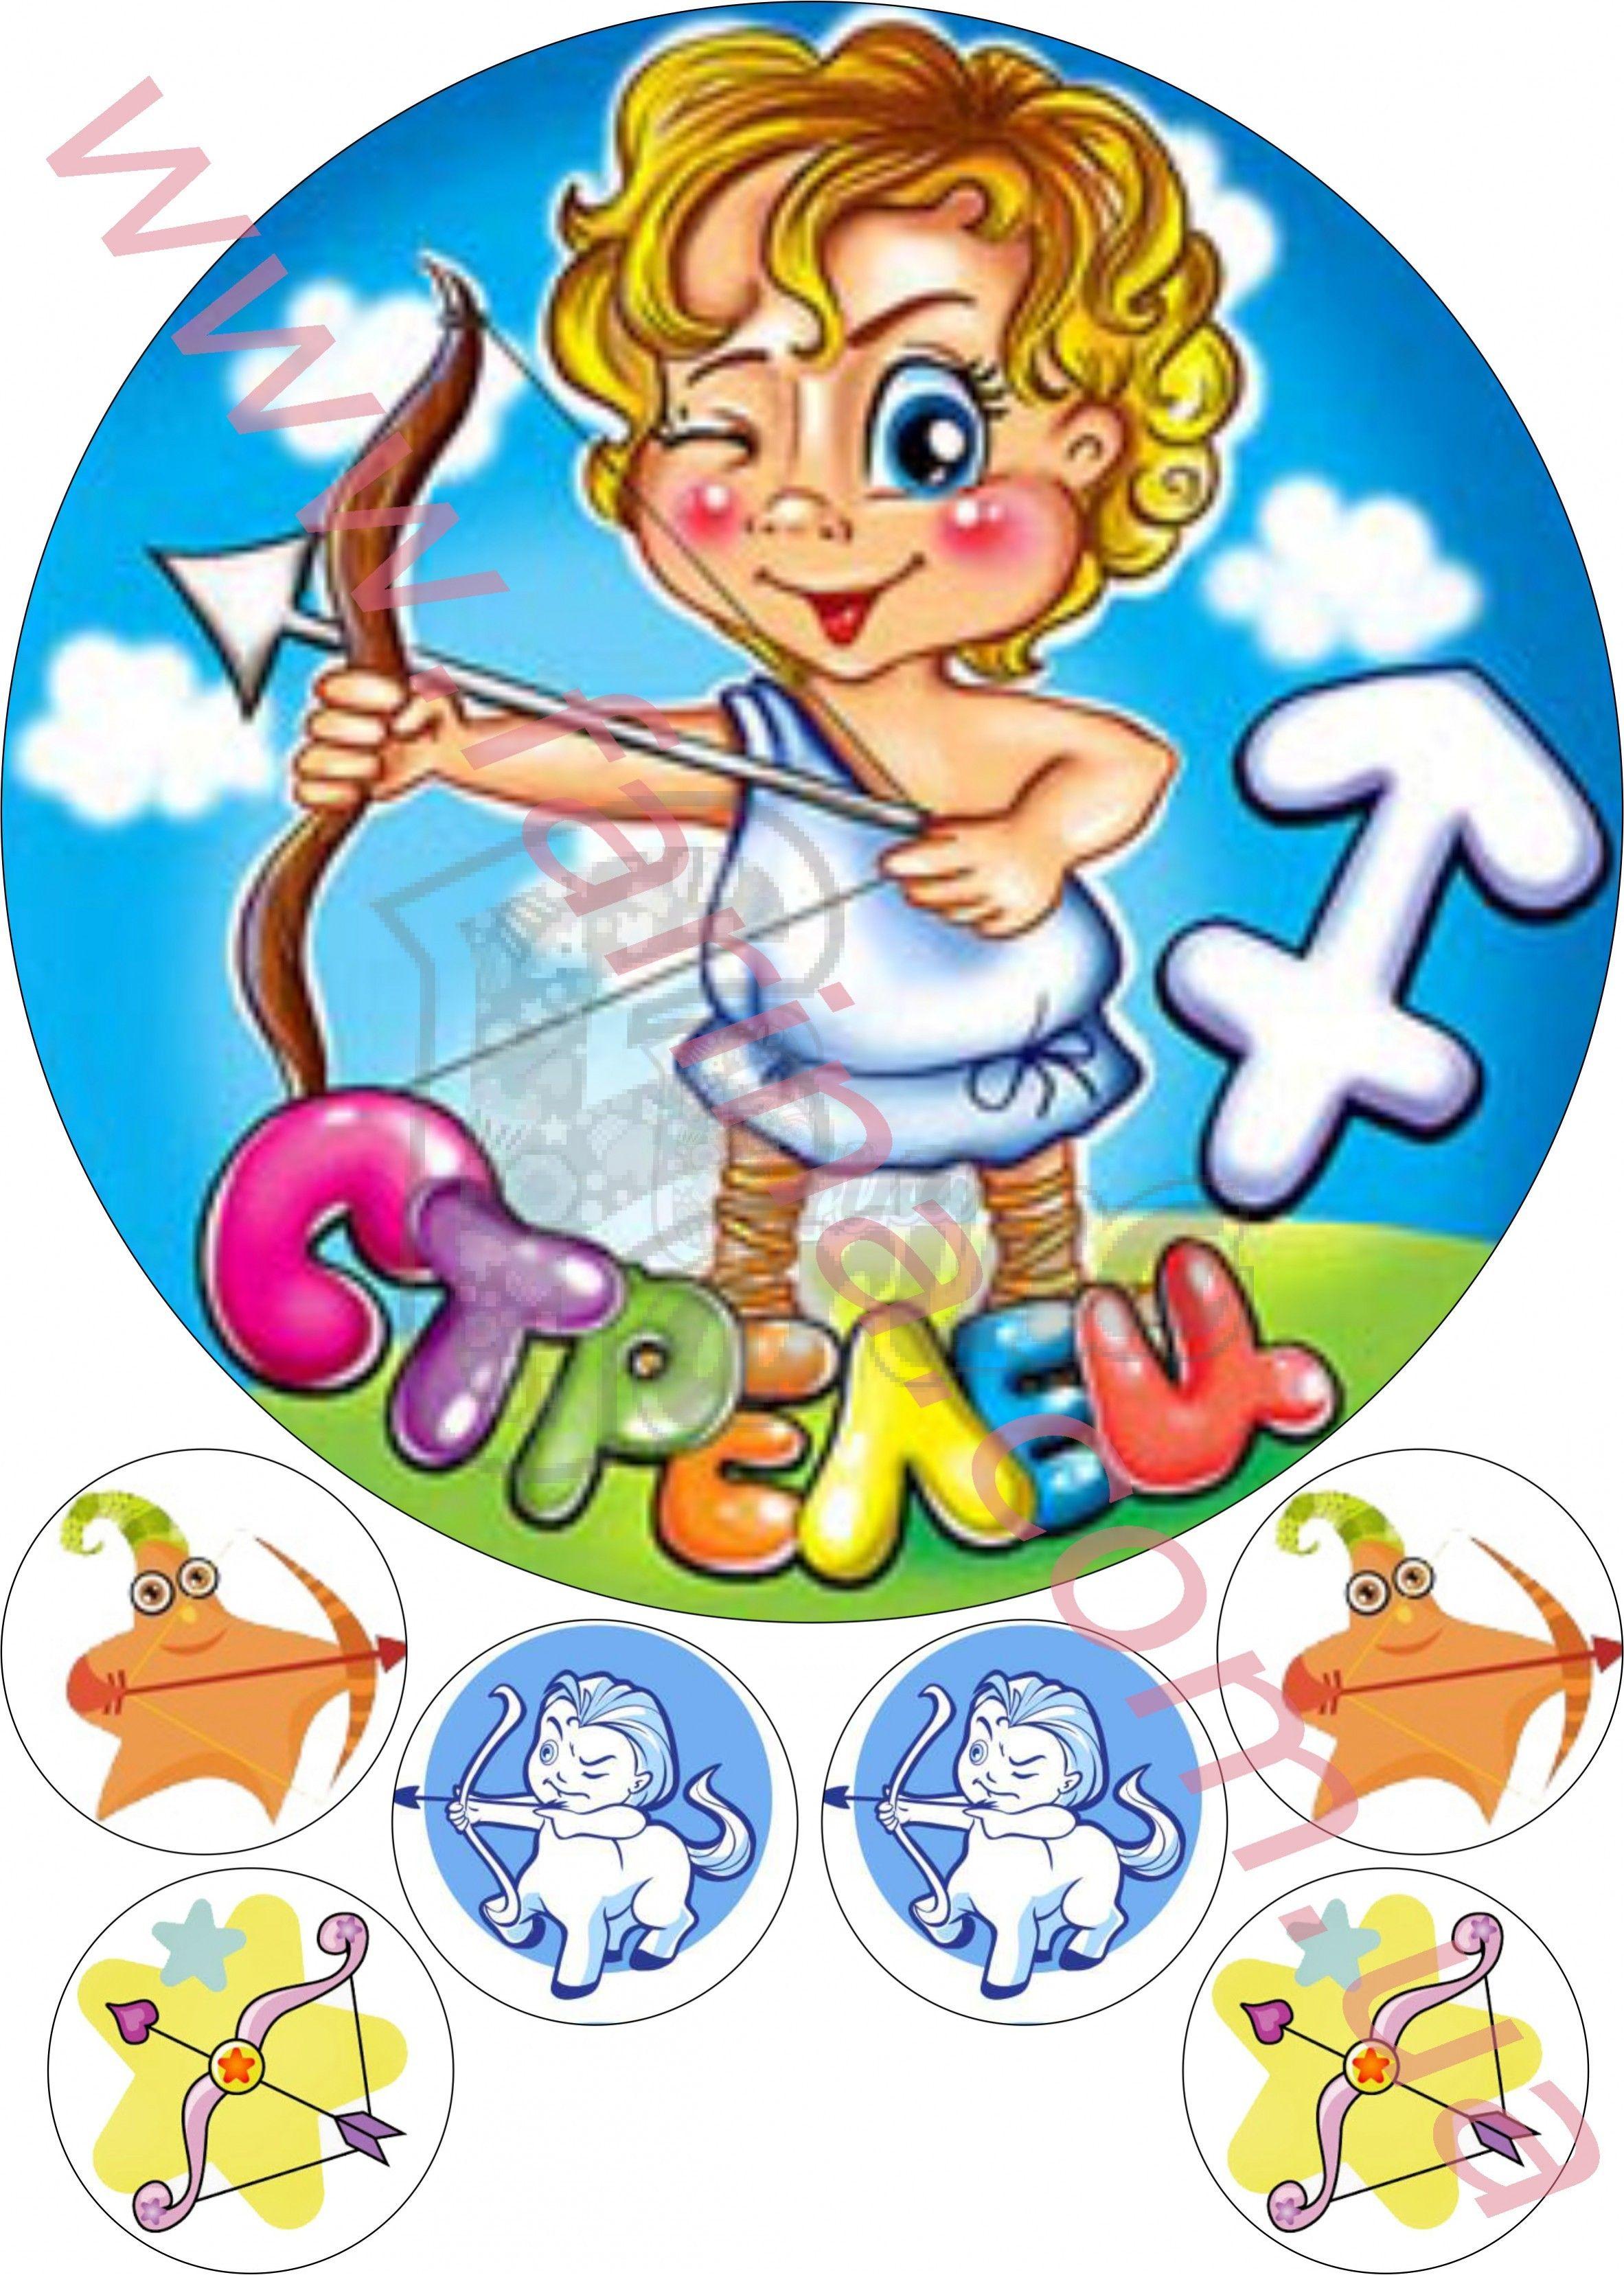 Знак зодиака стрелец картинки для детей